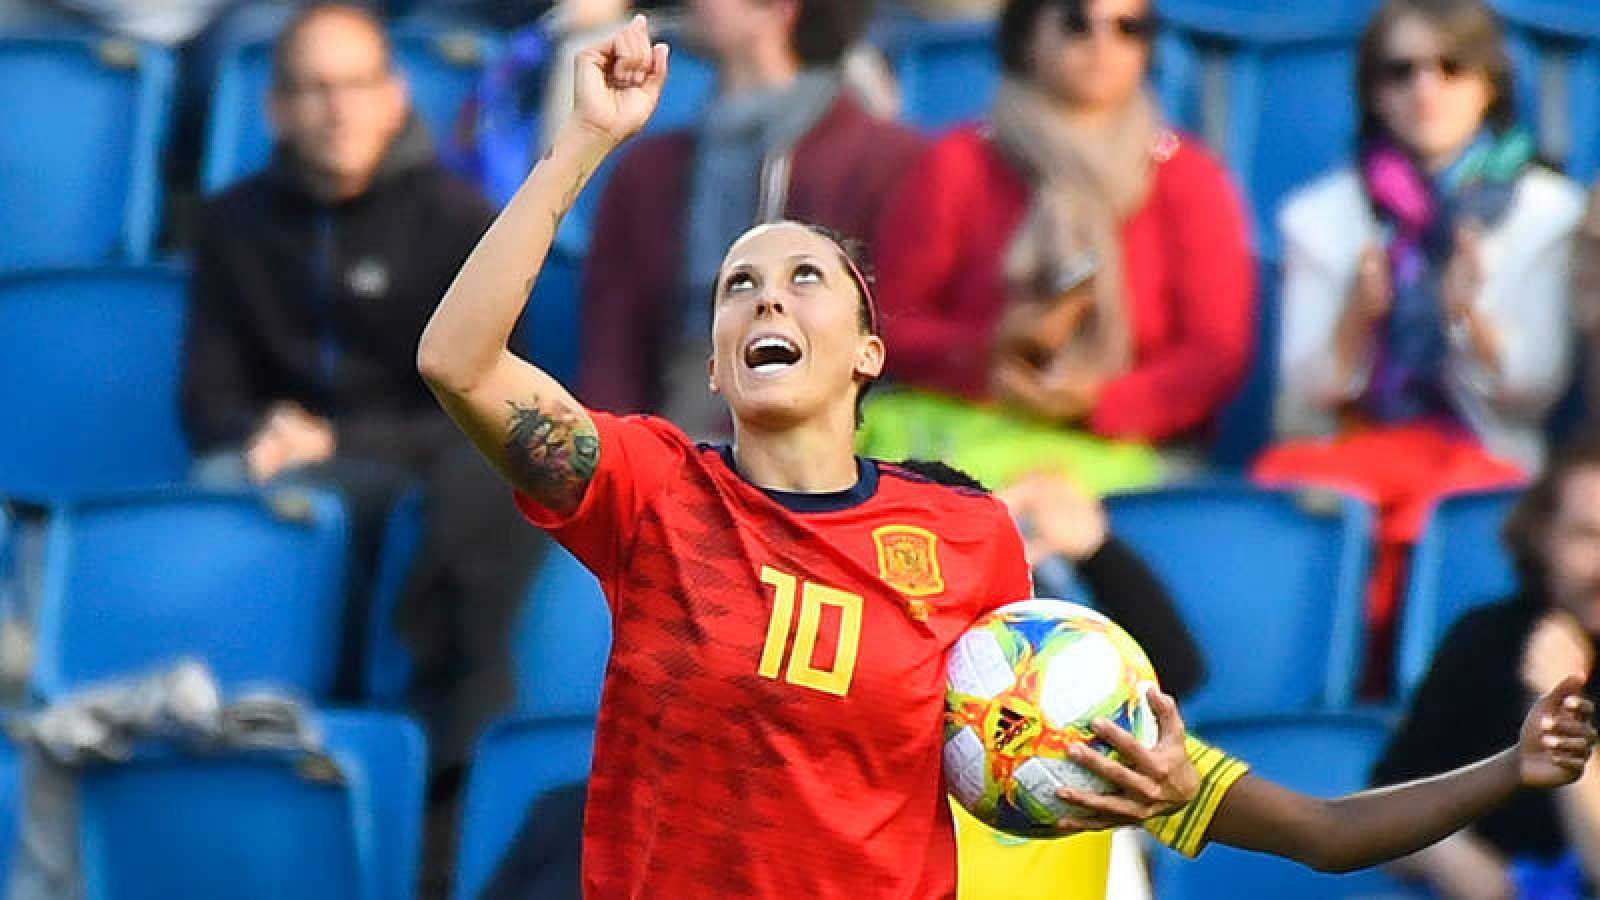 Jenni Hermoso celebra su primer penalti anotado